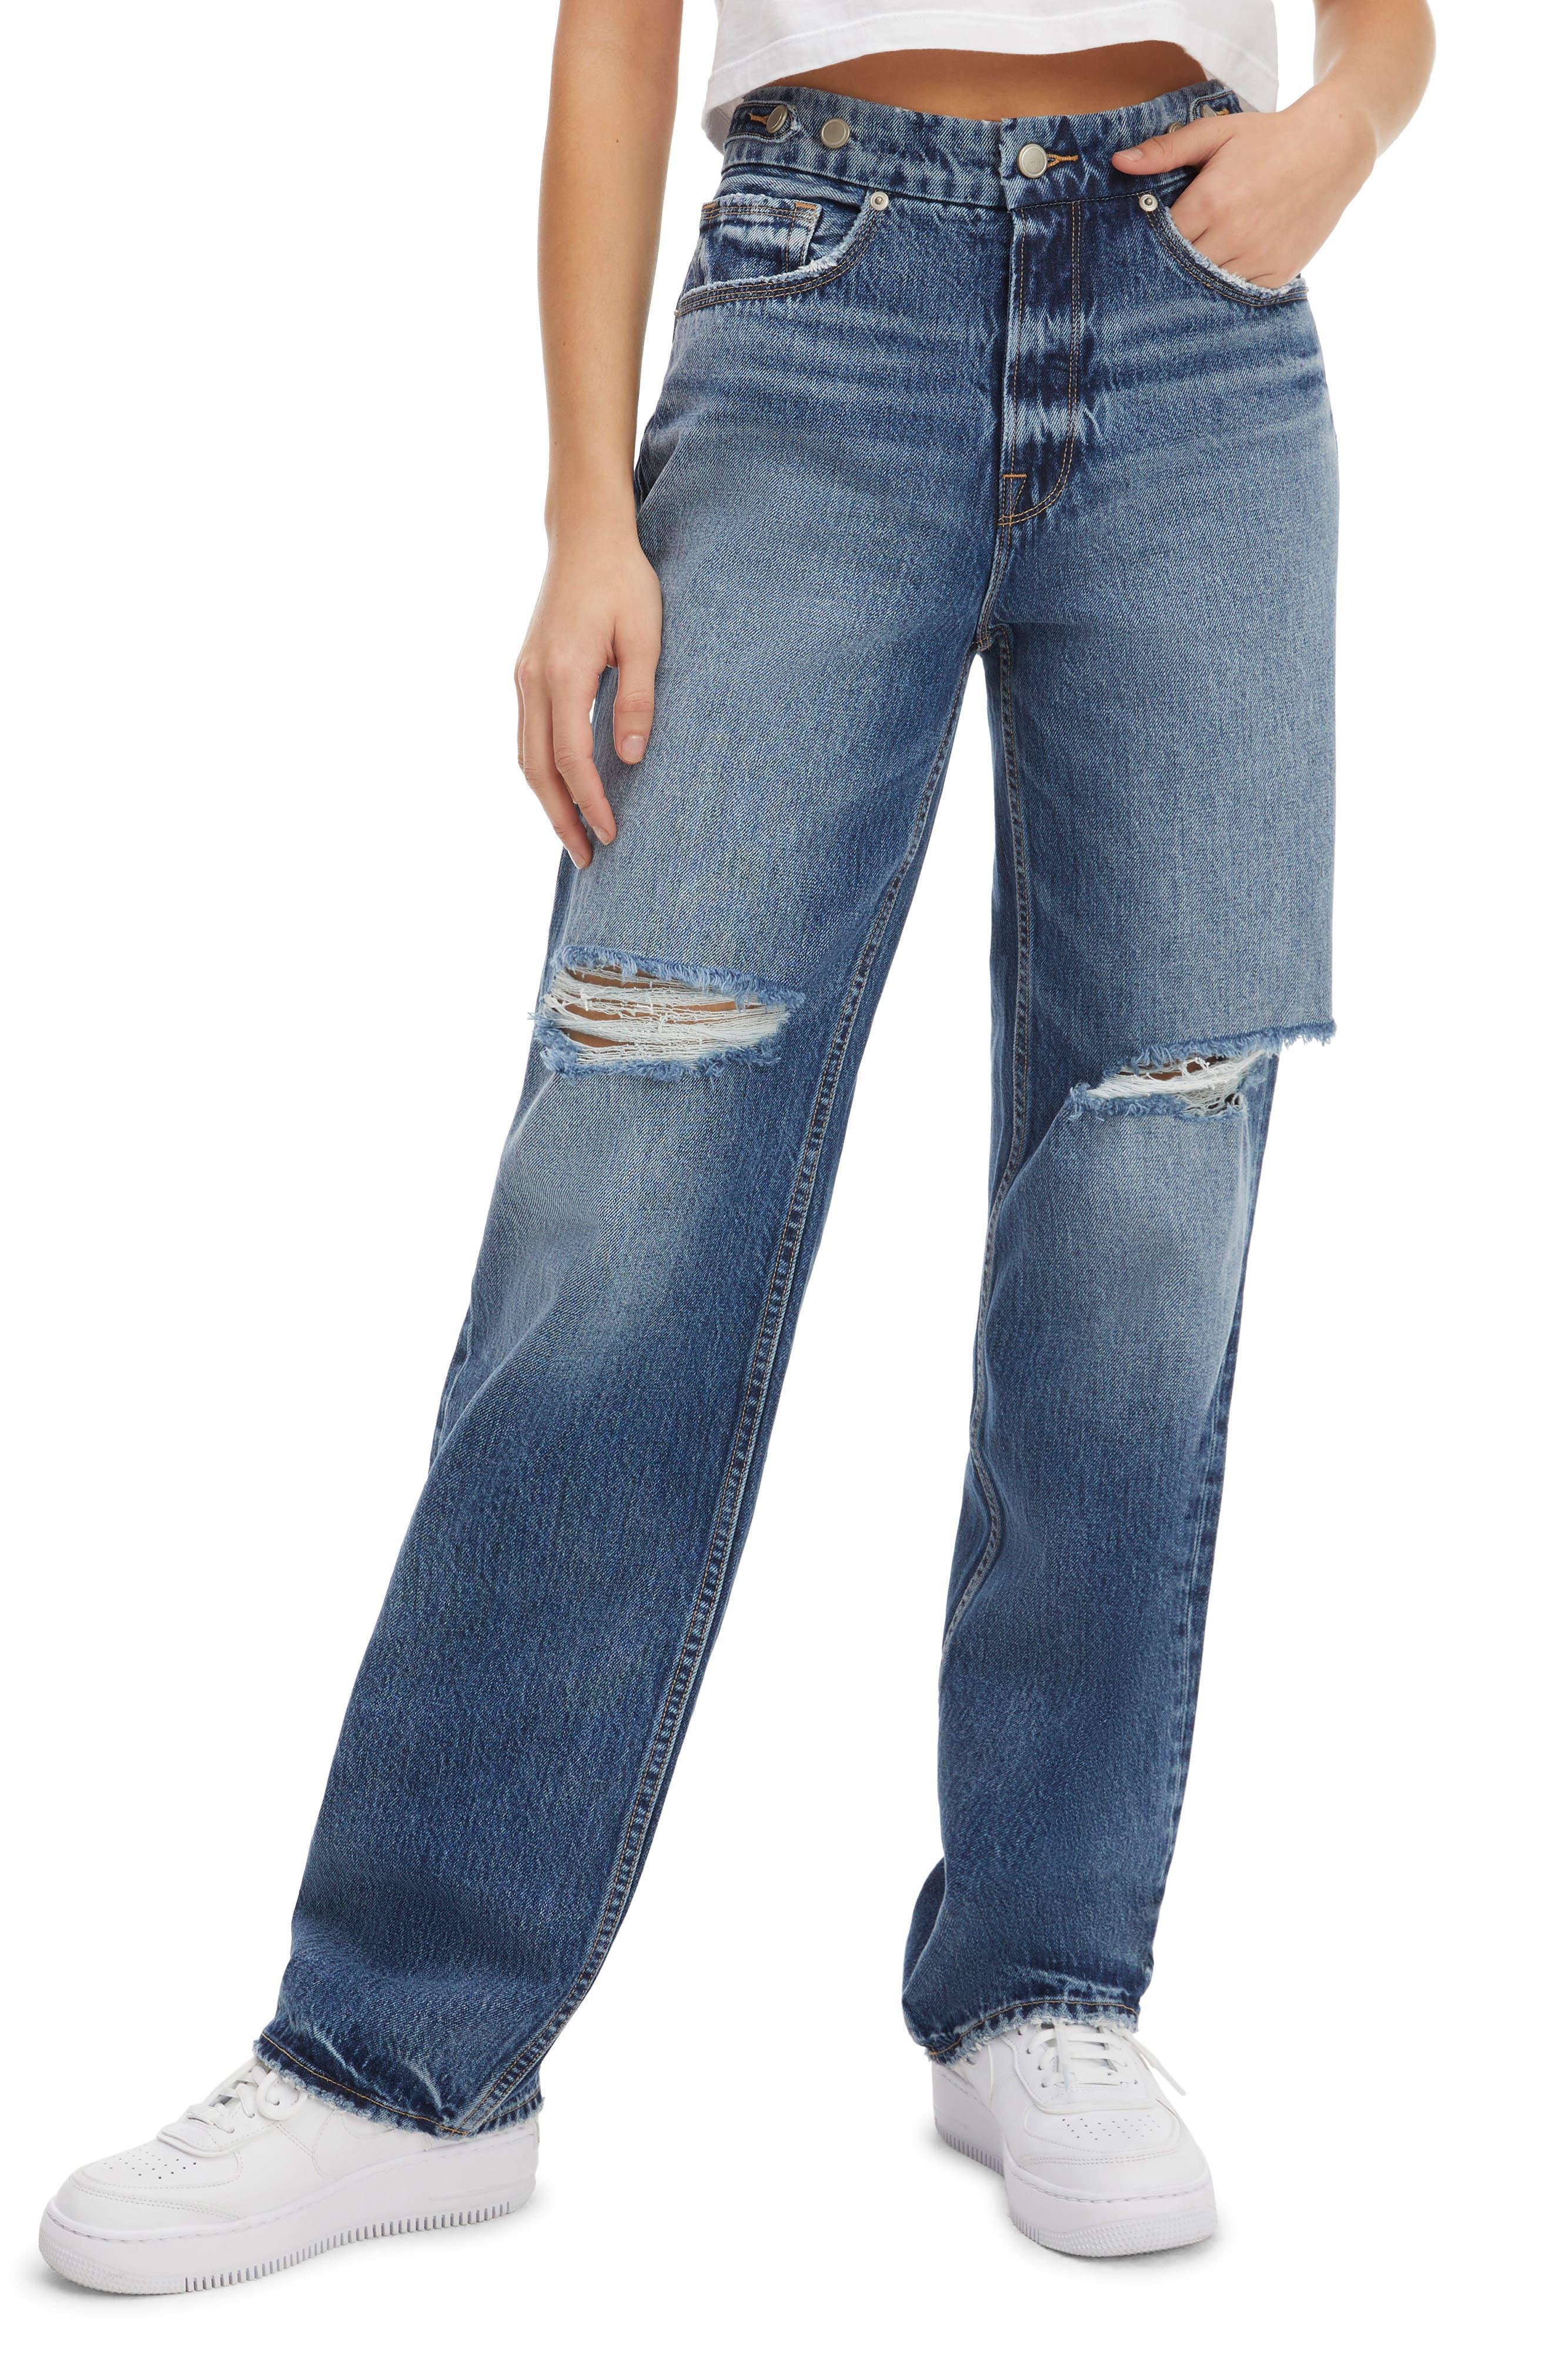 Women's Good American Good '90S Ripped Straight Leg Jeans